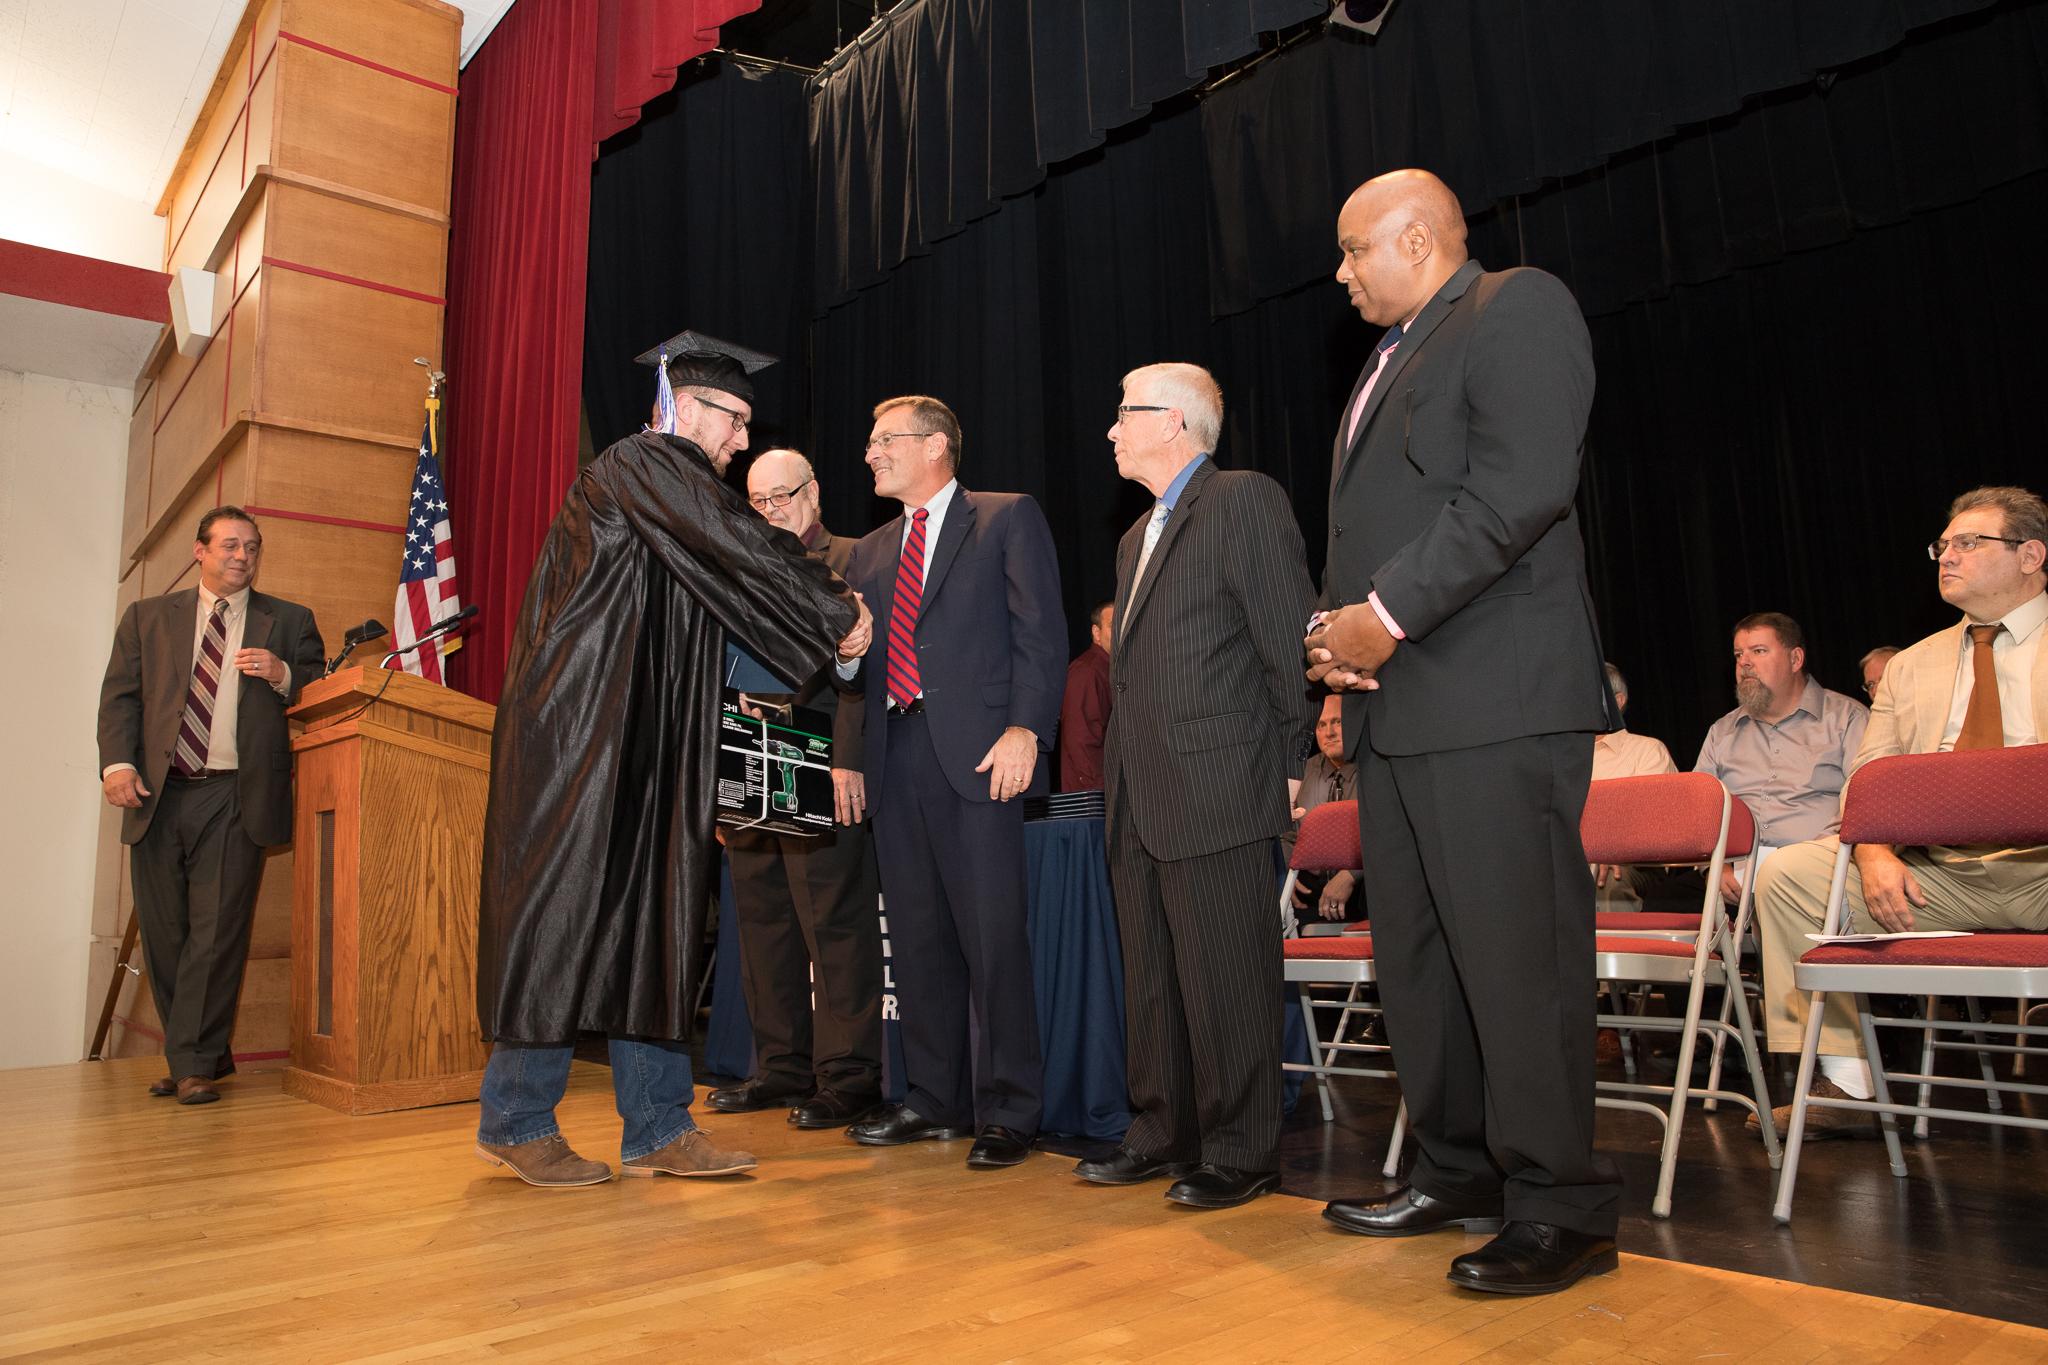 ncst_fall_2017_graduation-83.jpg